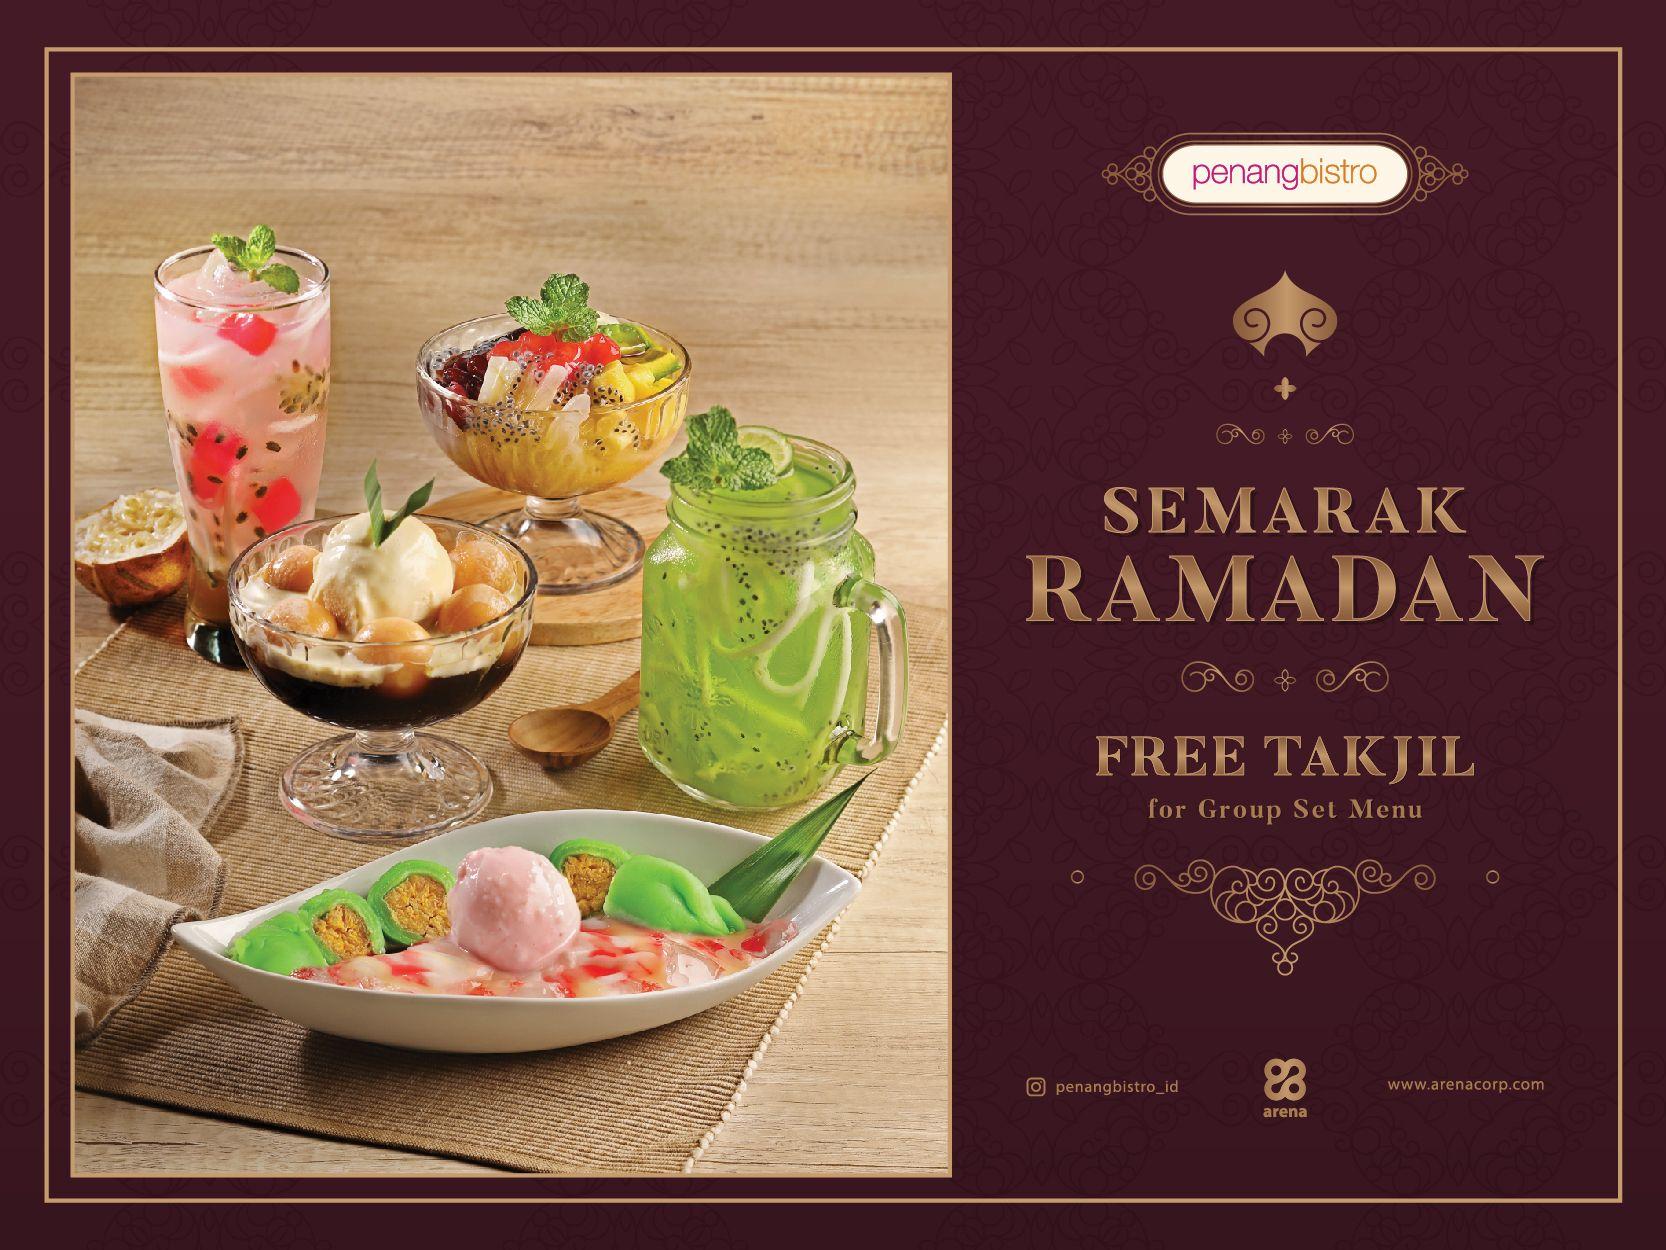 SEMARAK RAMADAN - FREE TAKJIL FOR GROUP SET MENU image